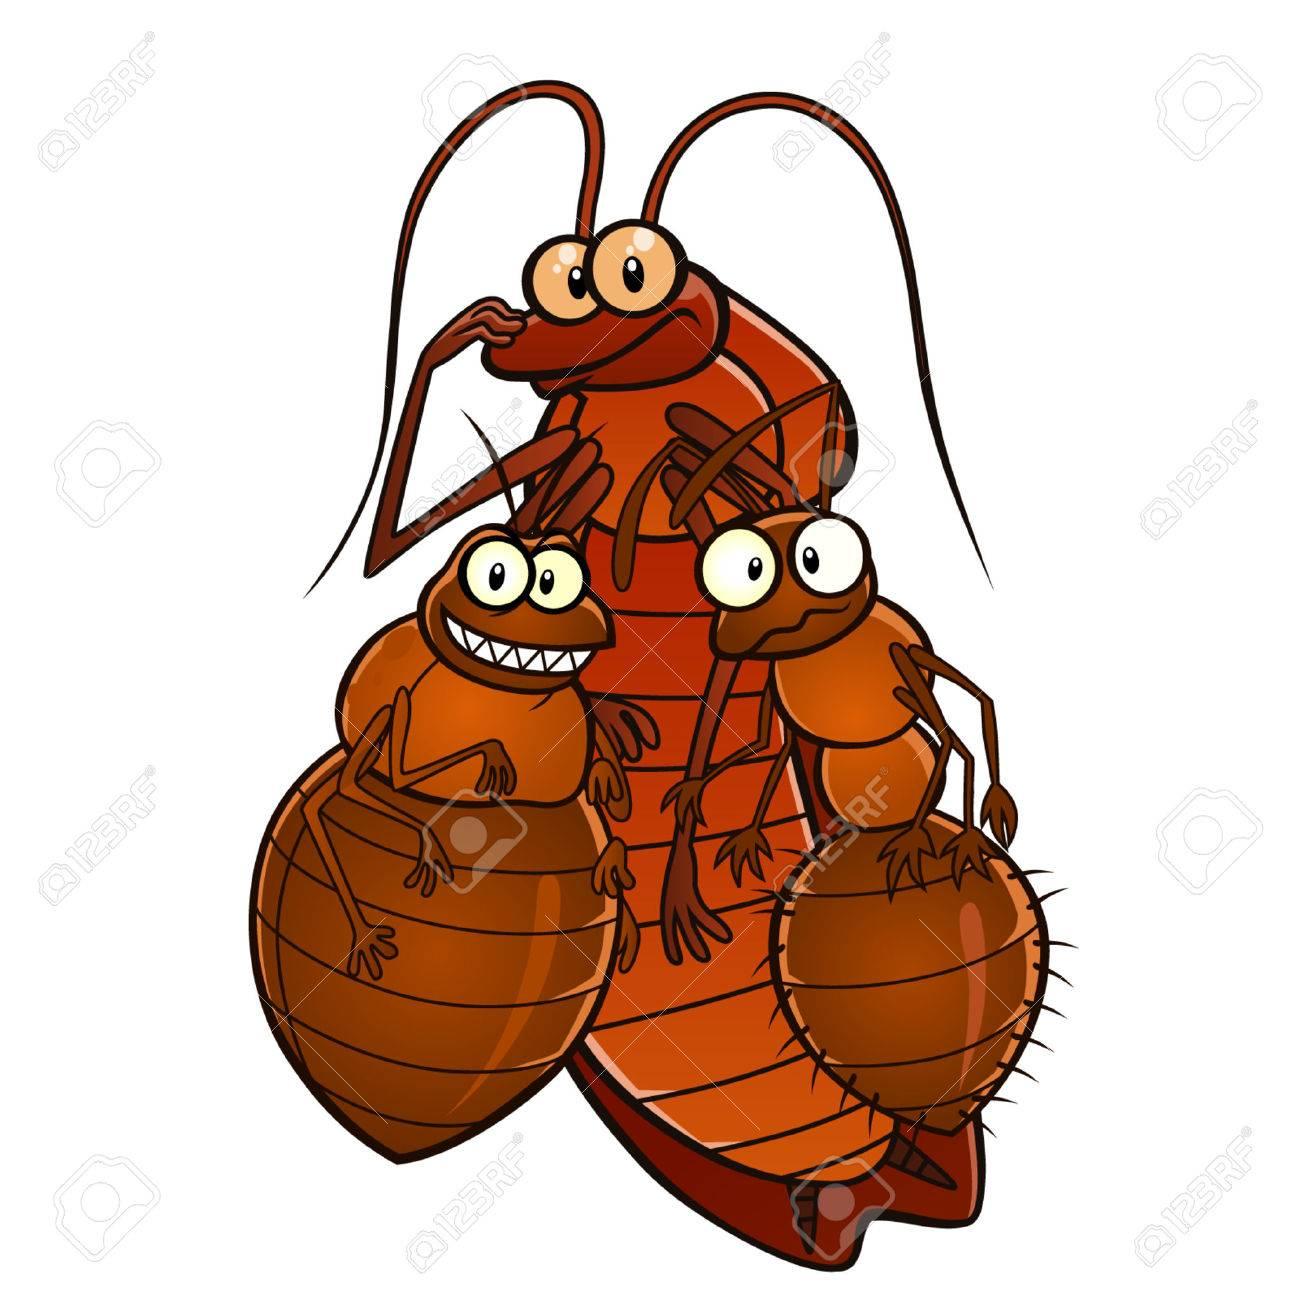 Domestic pests - 40825443